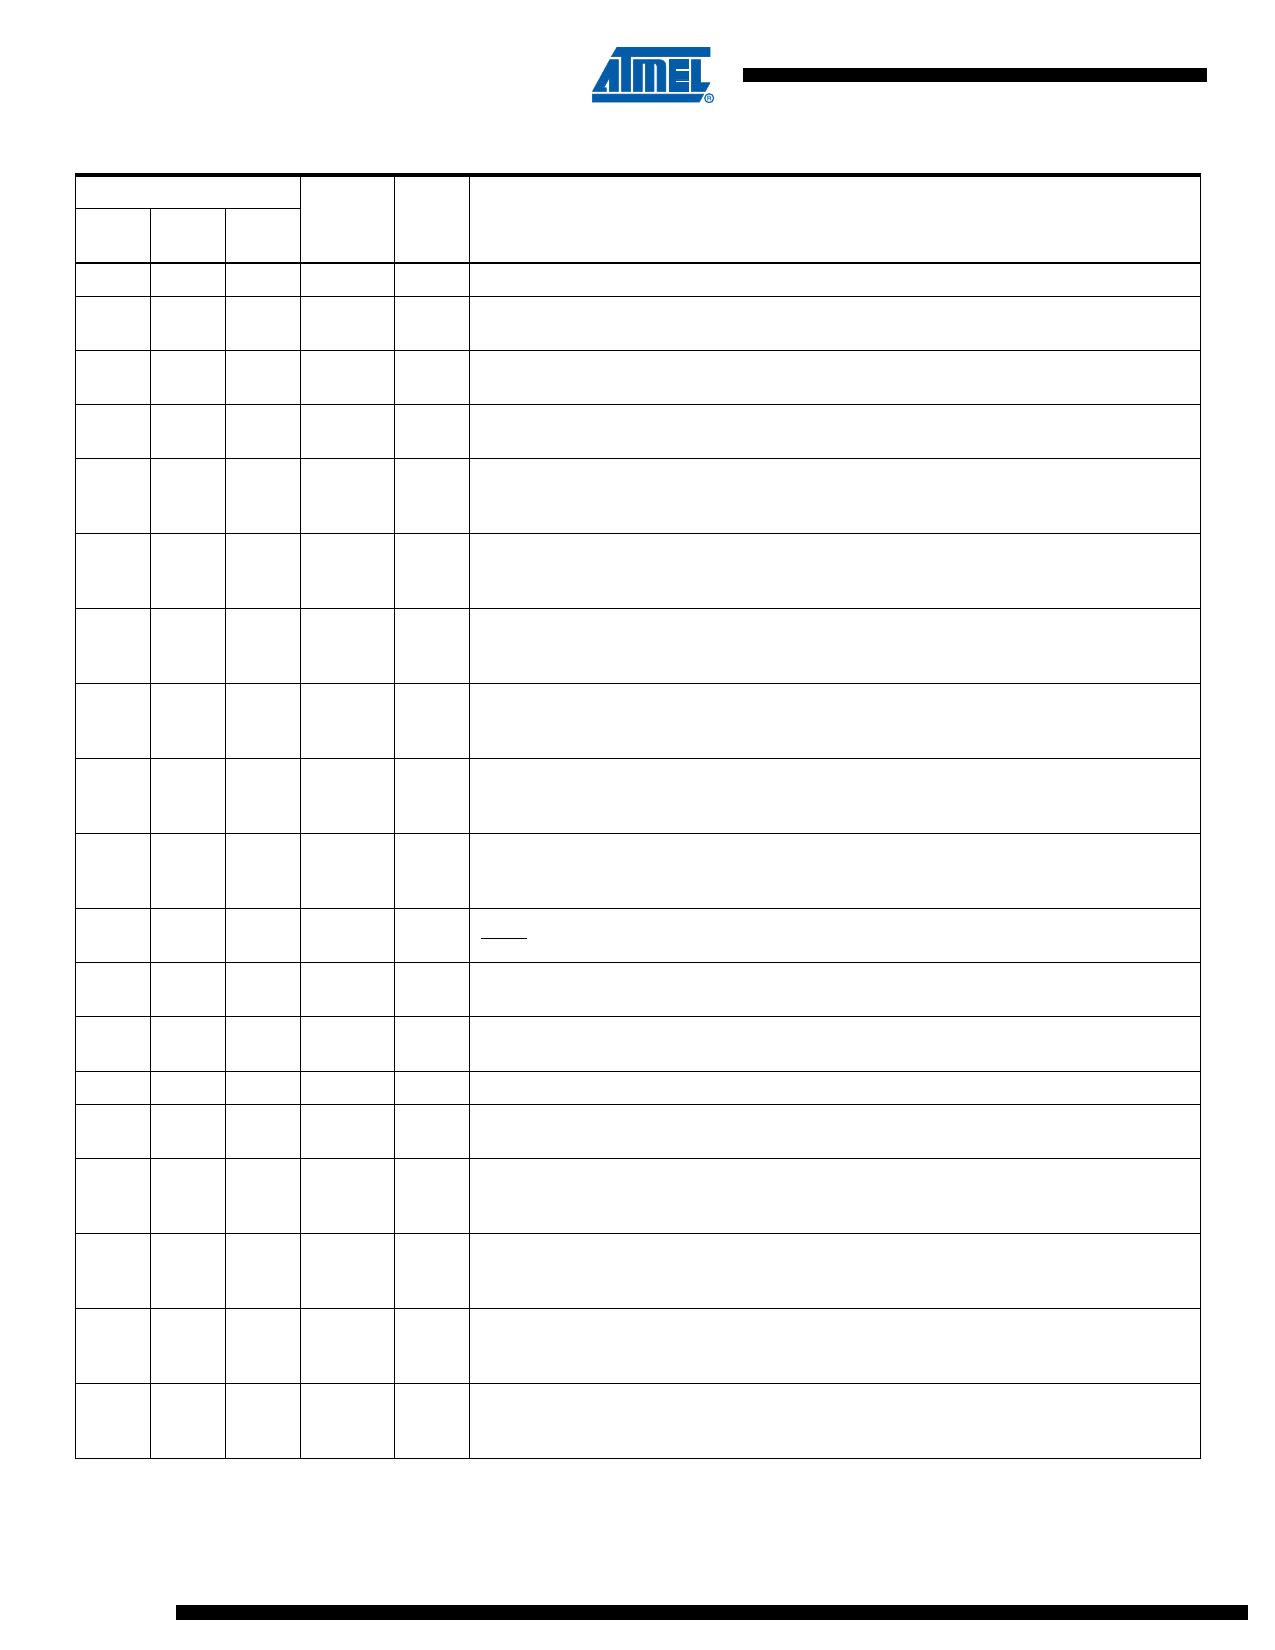 AT89LP51RD2 pdf, 반도체, 판매, 대치품